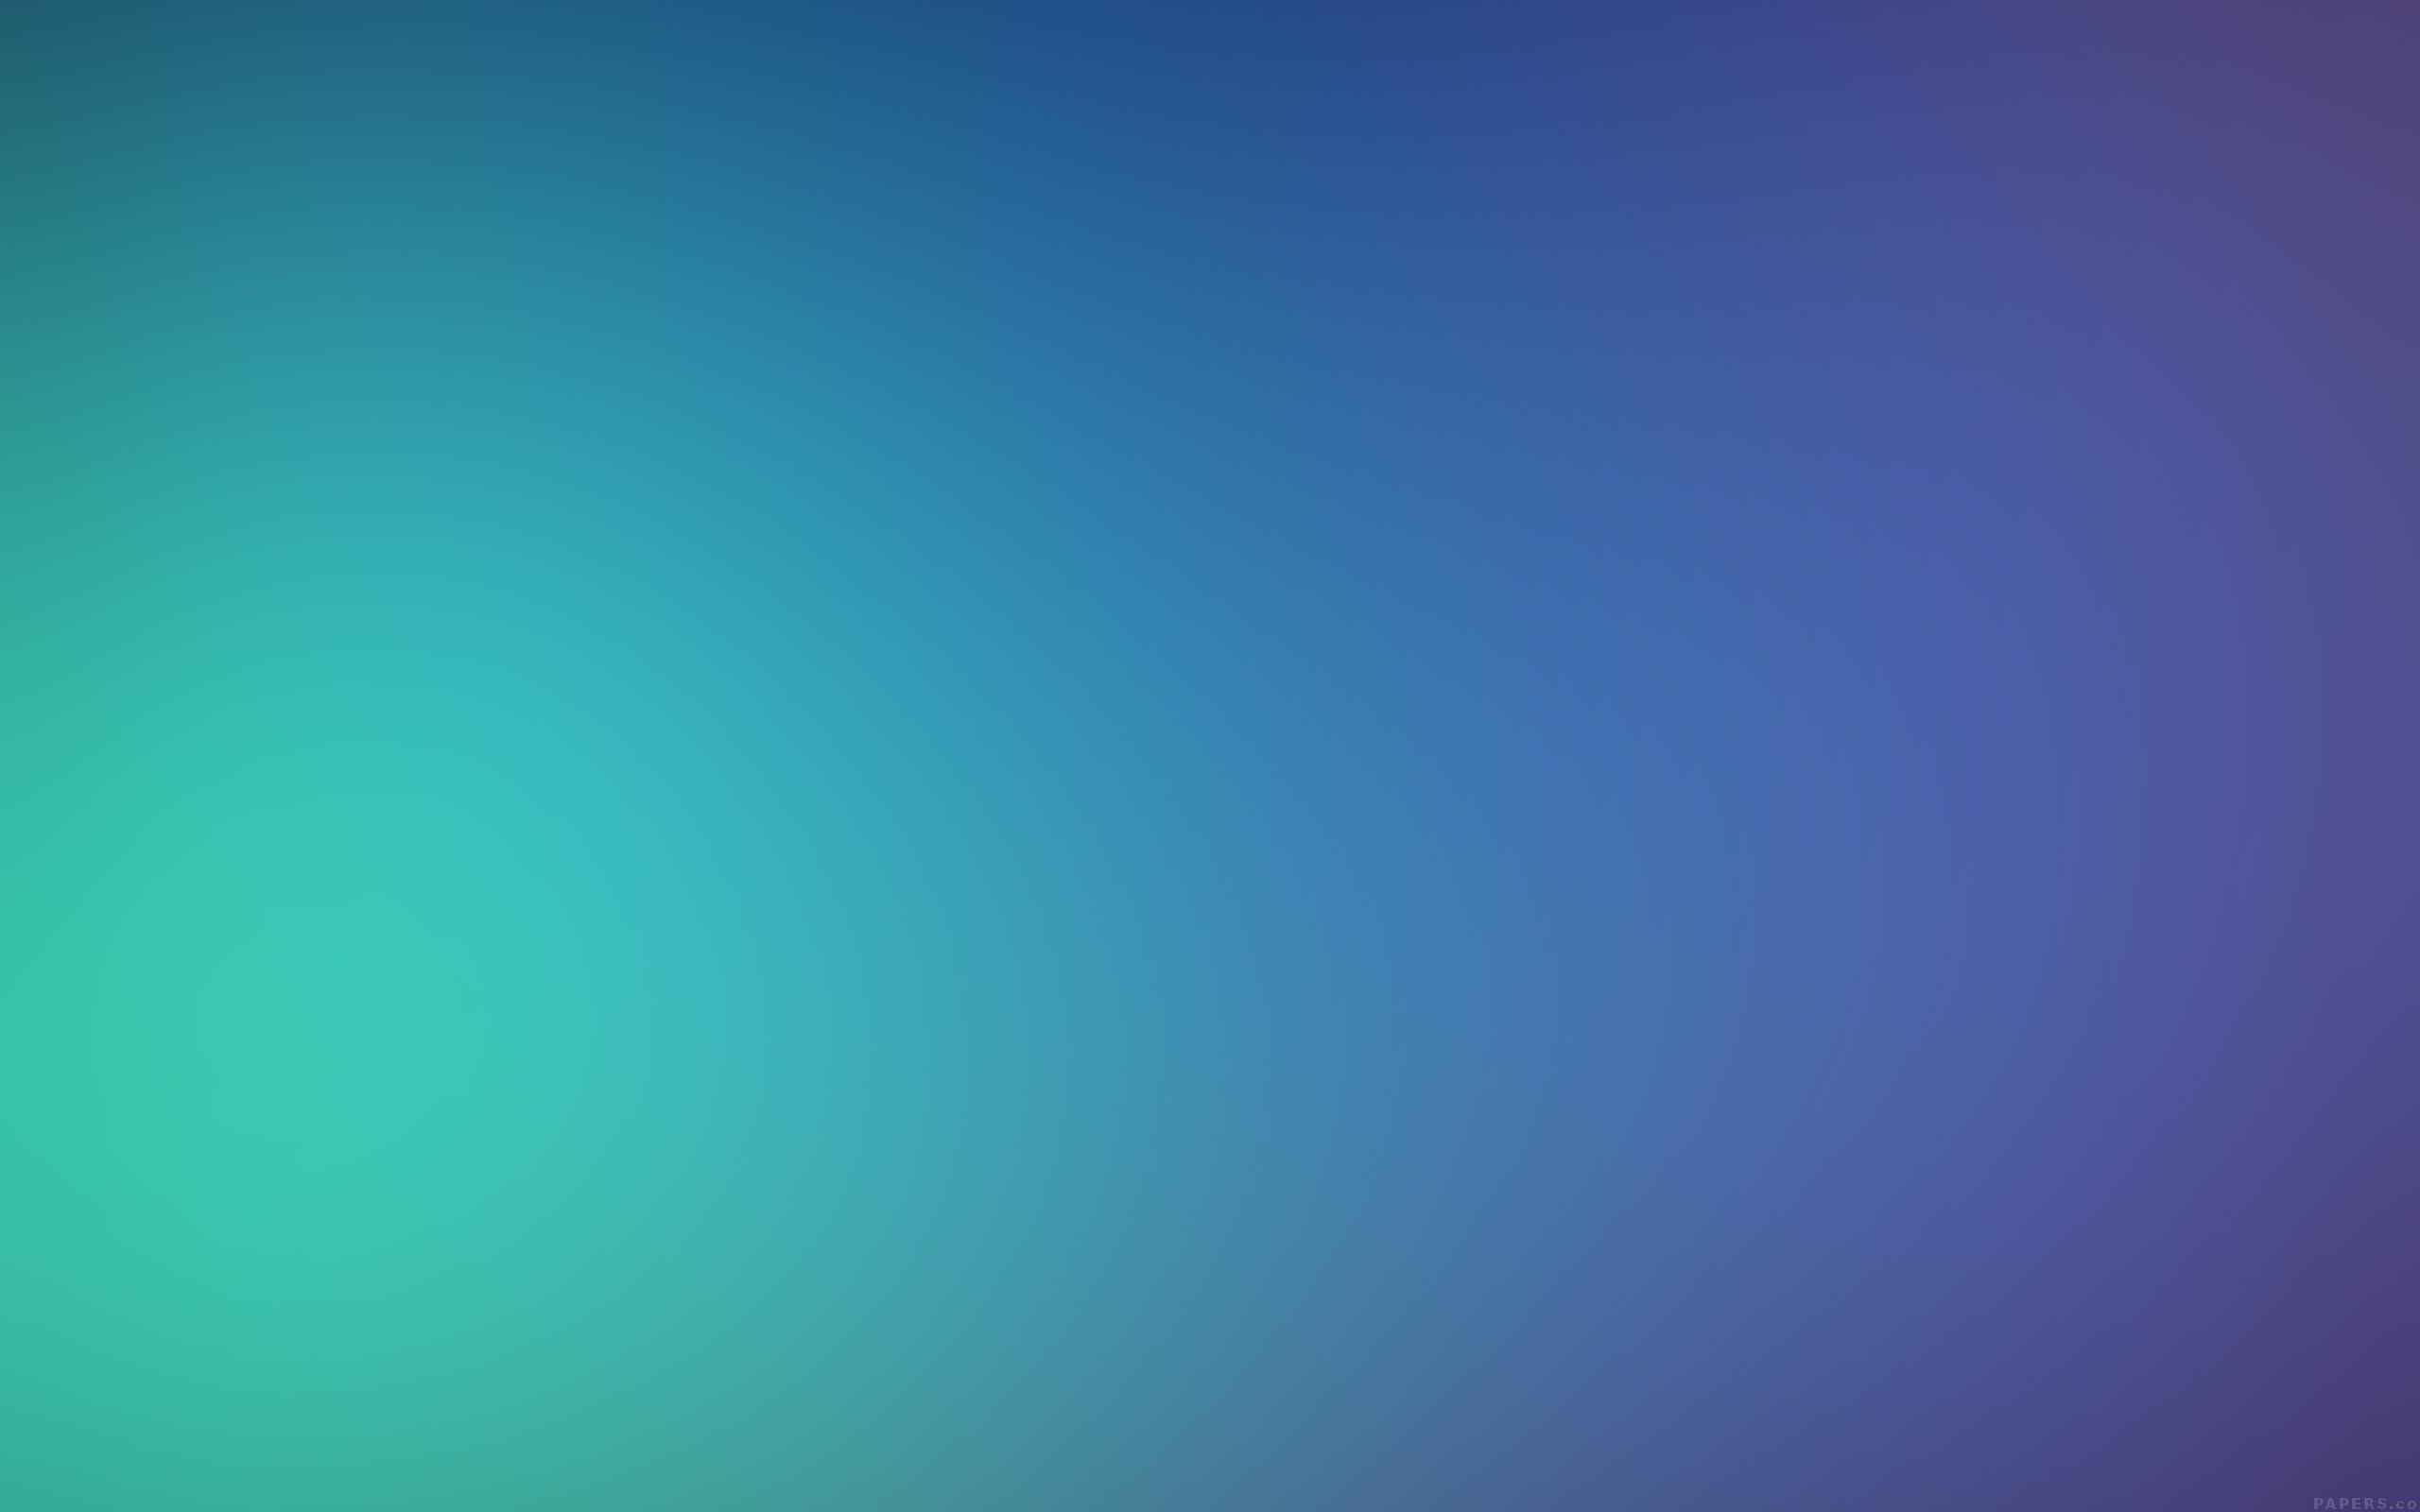 Iphone 5 Car Wallpaper Sd69 Blue Windows Green Gradation Blur Papers Co